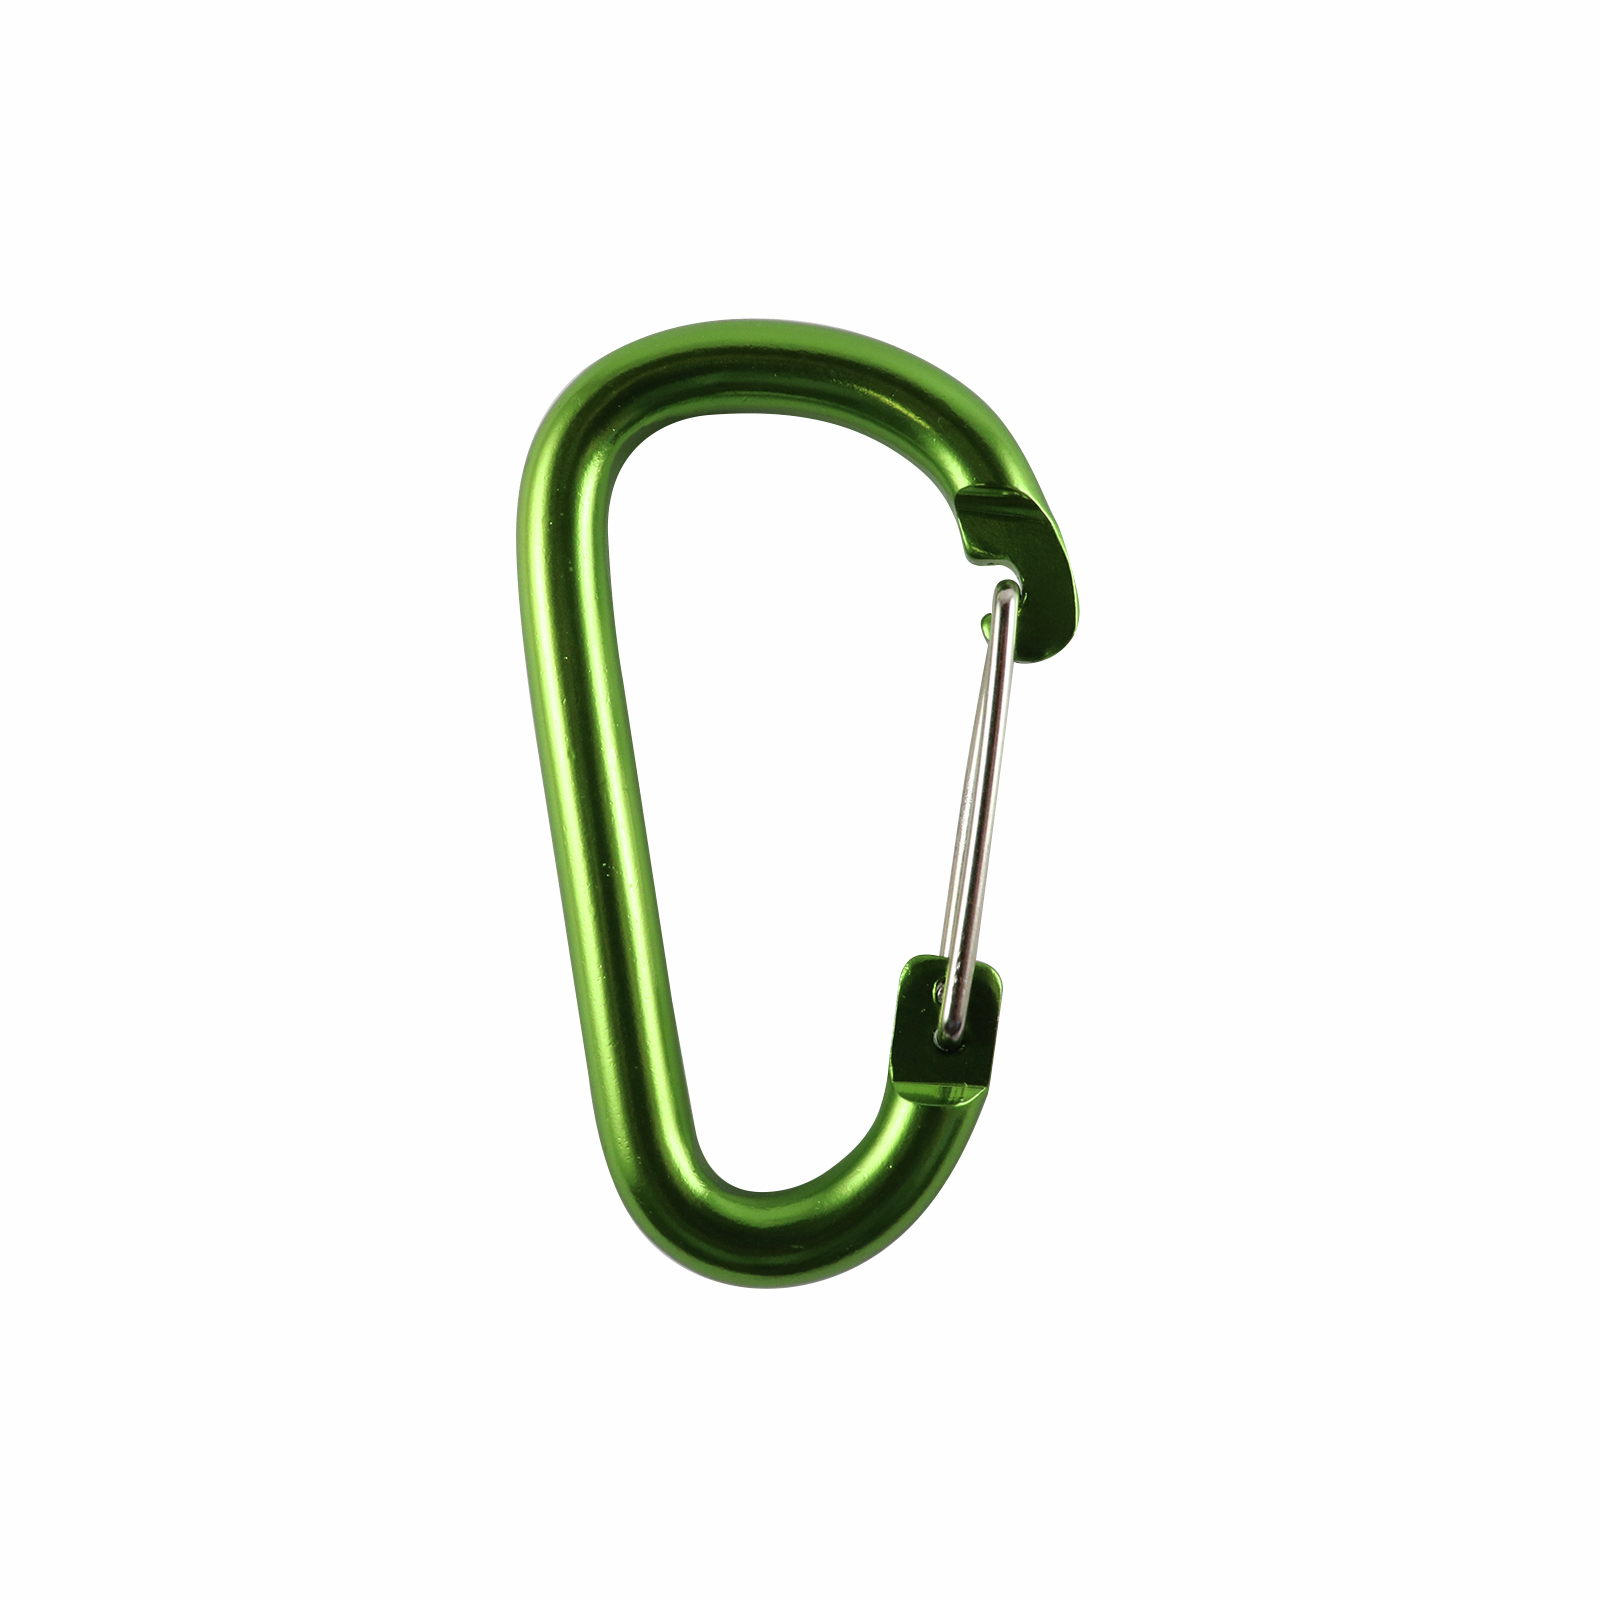 Key Essentials Key Ring Carabiner with Steel Gate